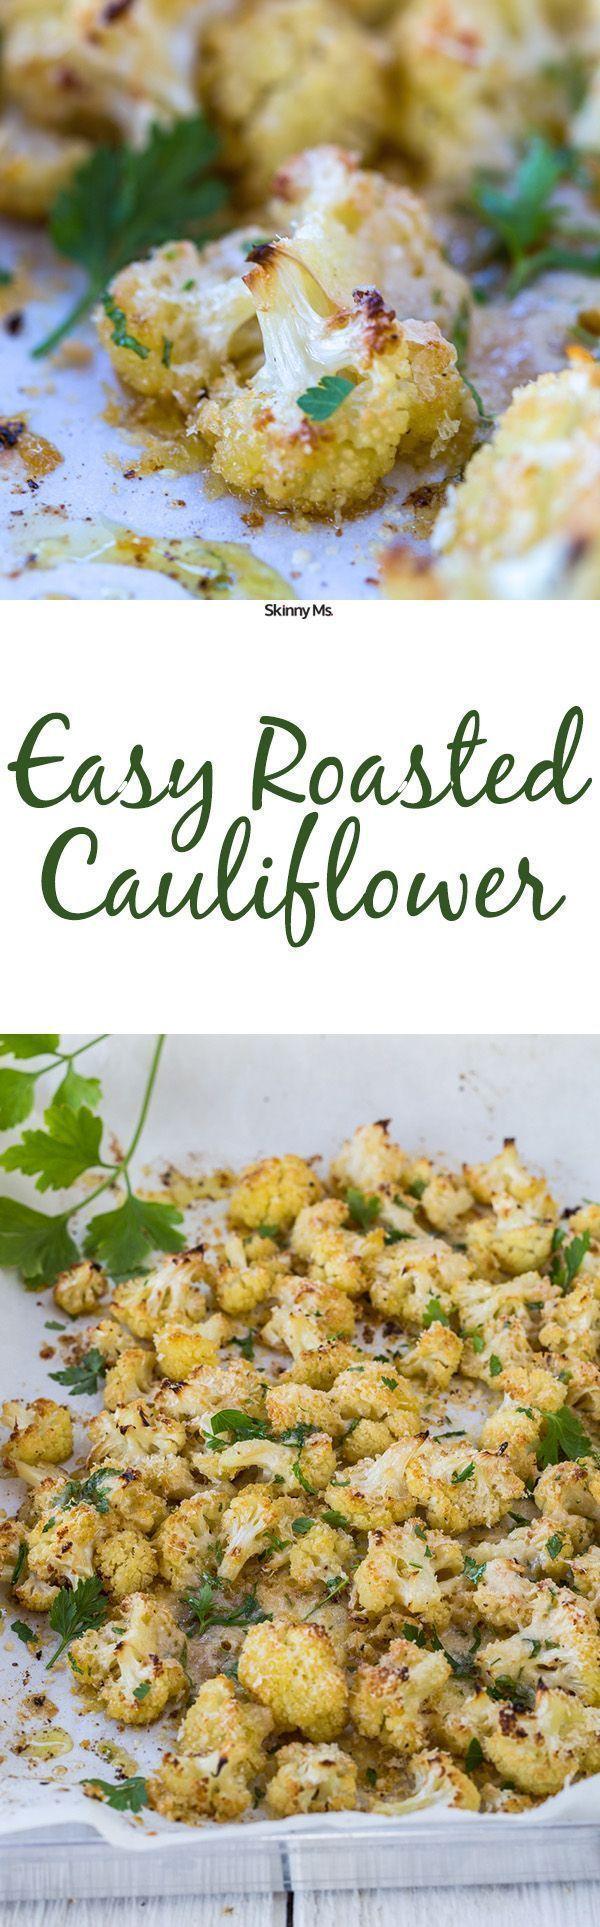 ... Cauliflower on Pinterest | Bacon, Cheesy cauliflower and Gluten free